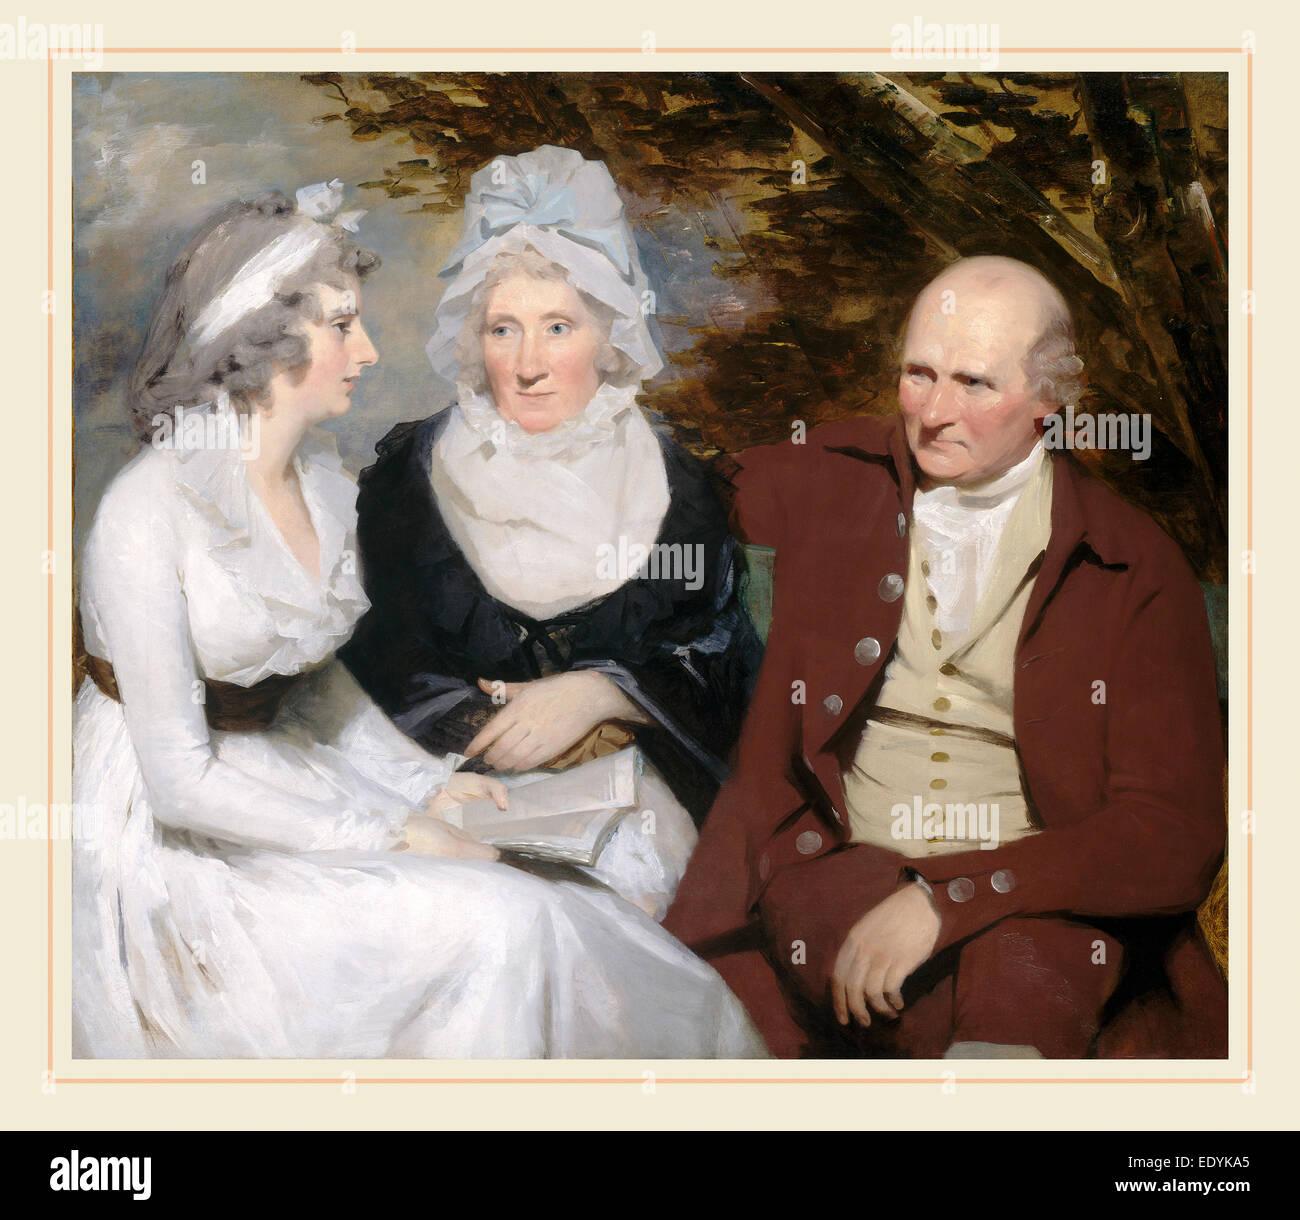 Sir Henry Raeburn, John Johnstone, Betty Johnstone, and Miss Wedderburn, Scottish, 1756-1823, c. 1790-1795, oil - Stock Image